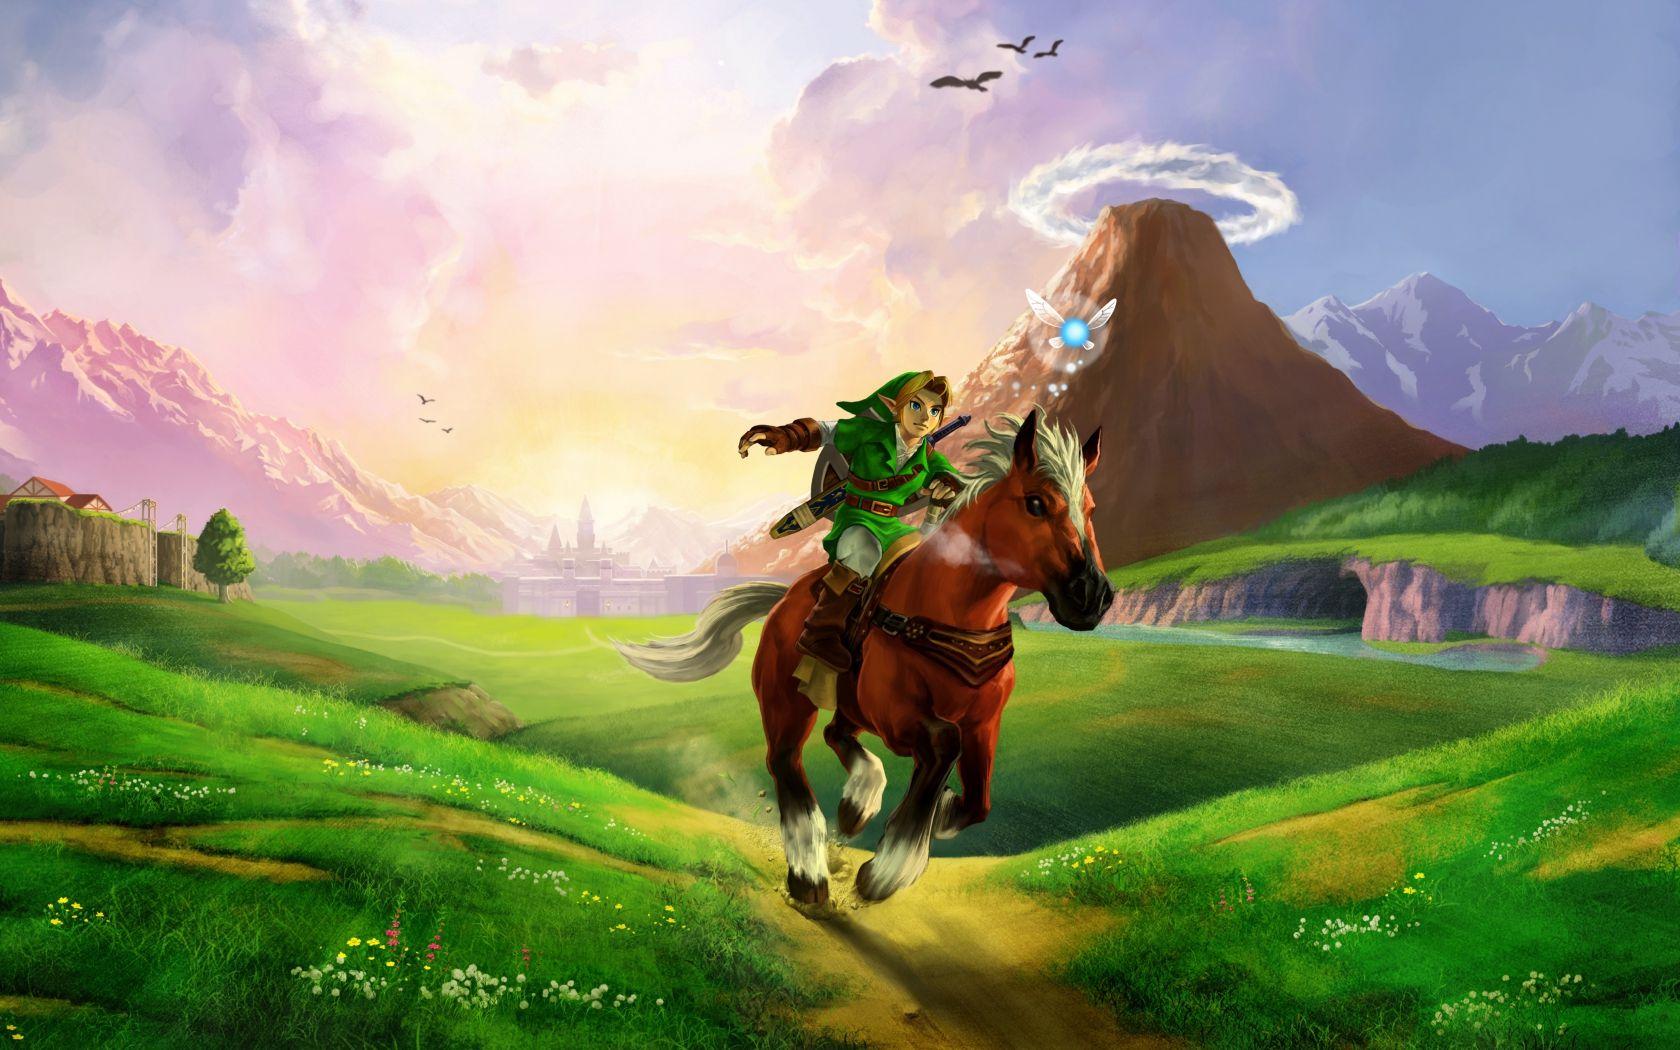 Ocarina Of Time 3d Wallpaper Legend Of Zelda Ocarina Of Time Zelda Art